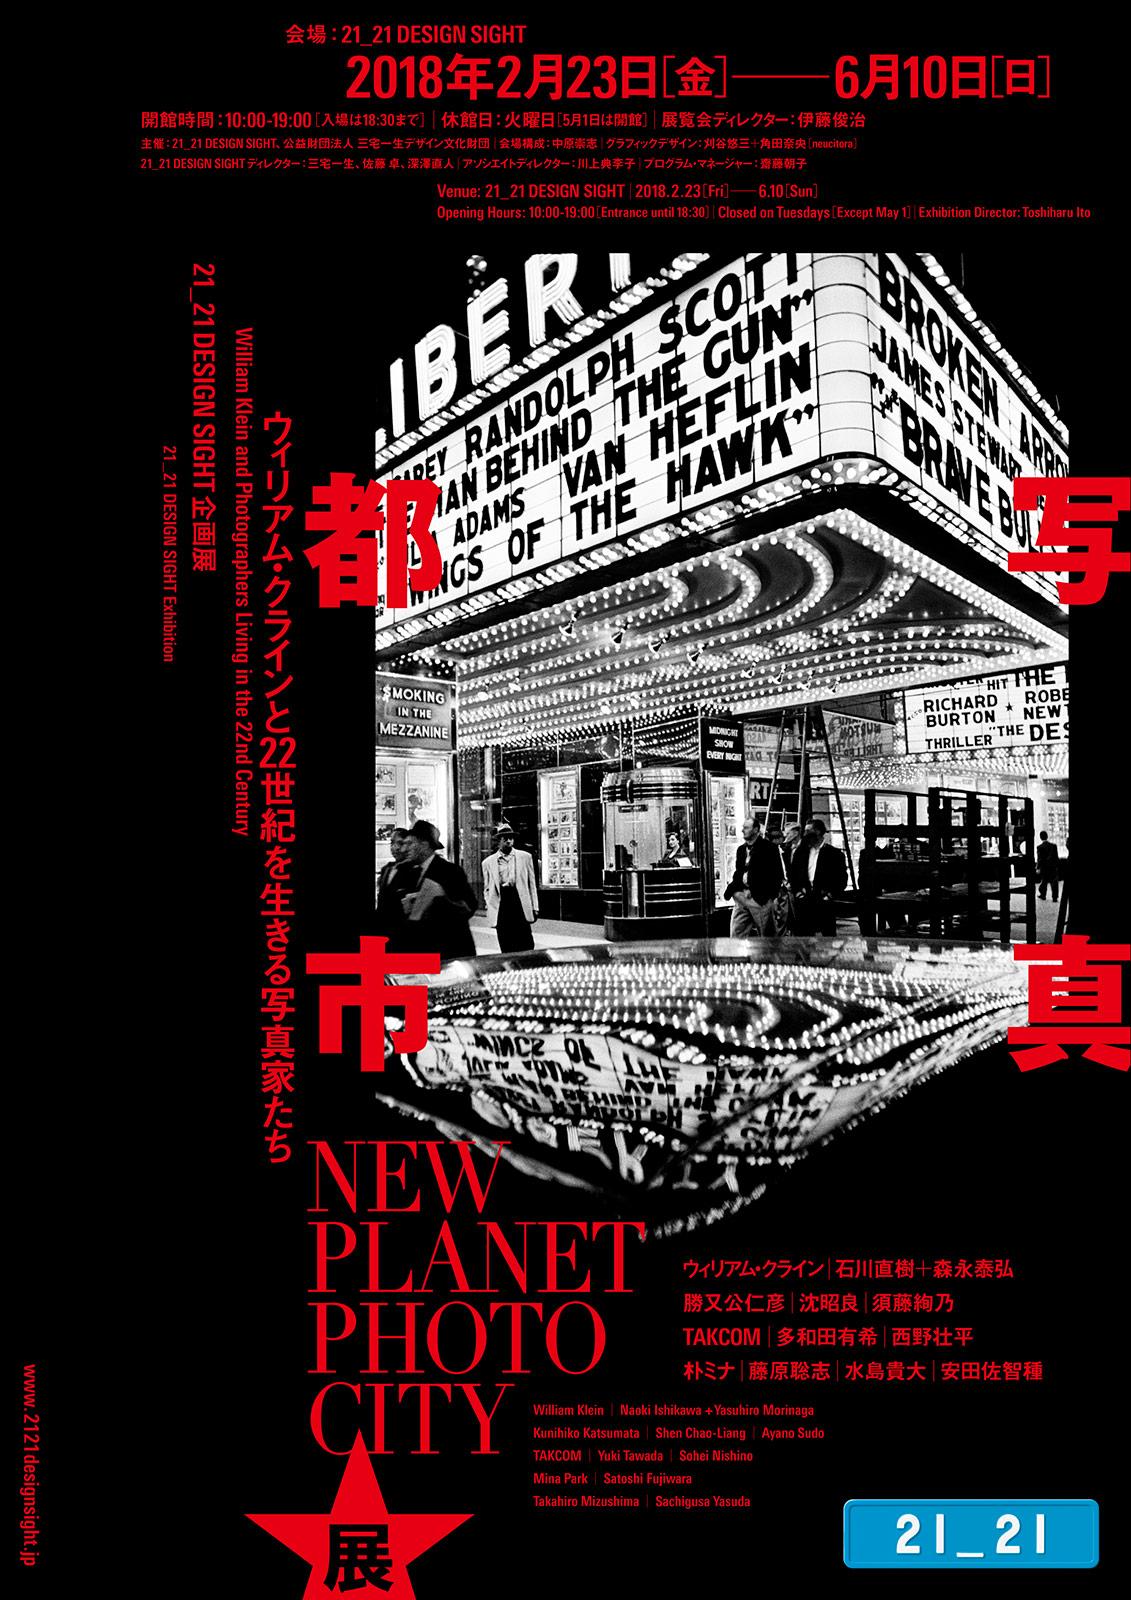 Newplanetphotocity metalmagazine 1